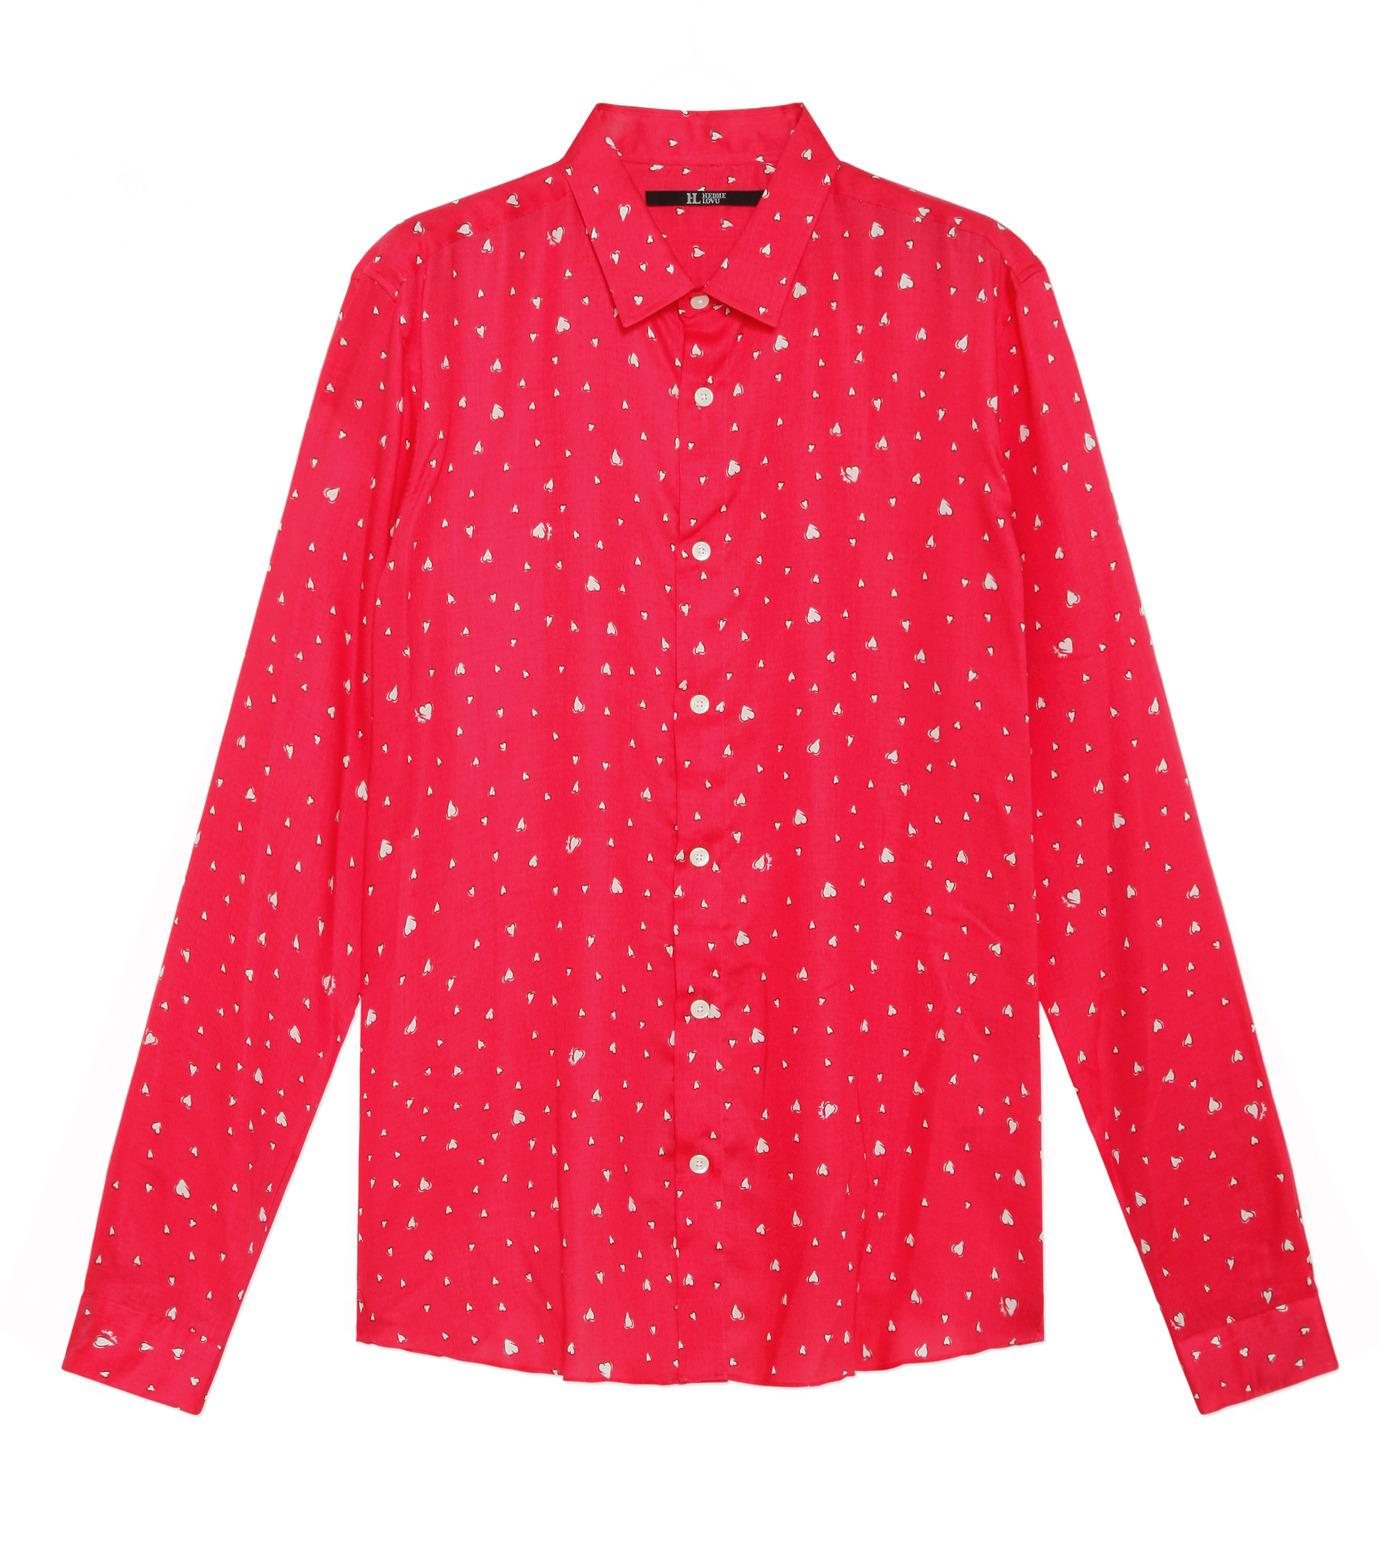 HL HEDDIE LOVU(エイチエル・エディールーヴ)のHEART PATTERN SHIRT-PINK(シャツ/shirt)-18S93001-72 拡大詳細画像1